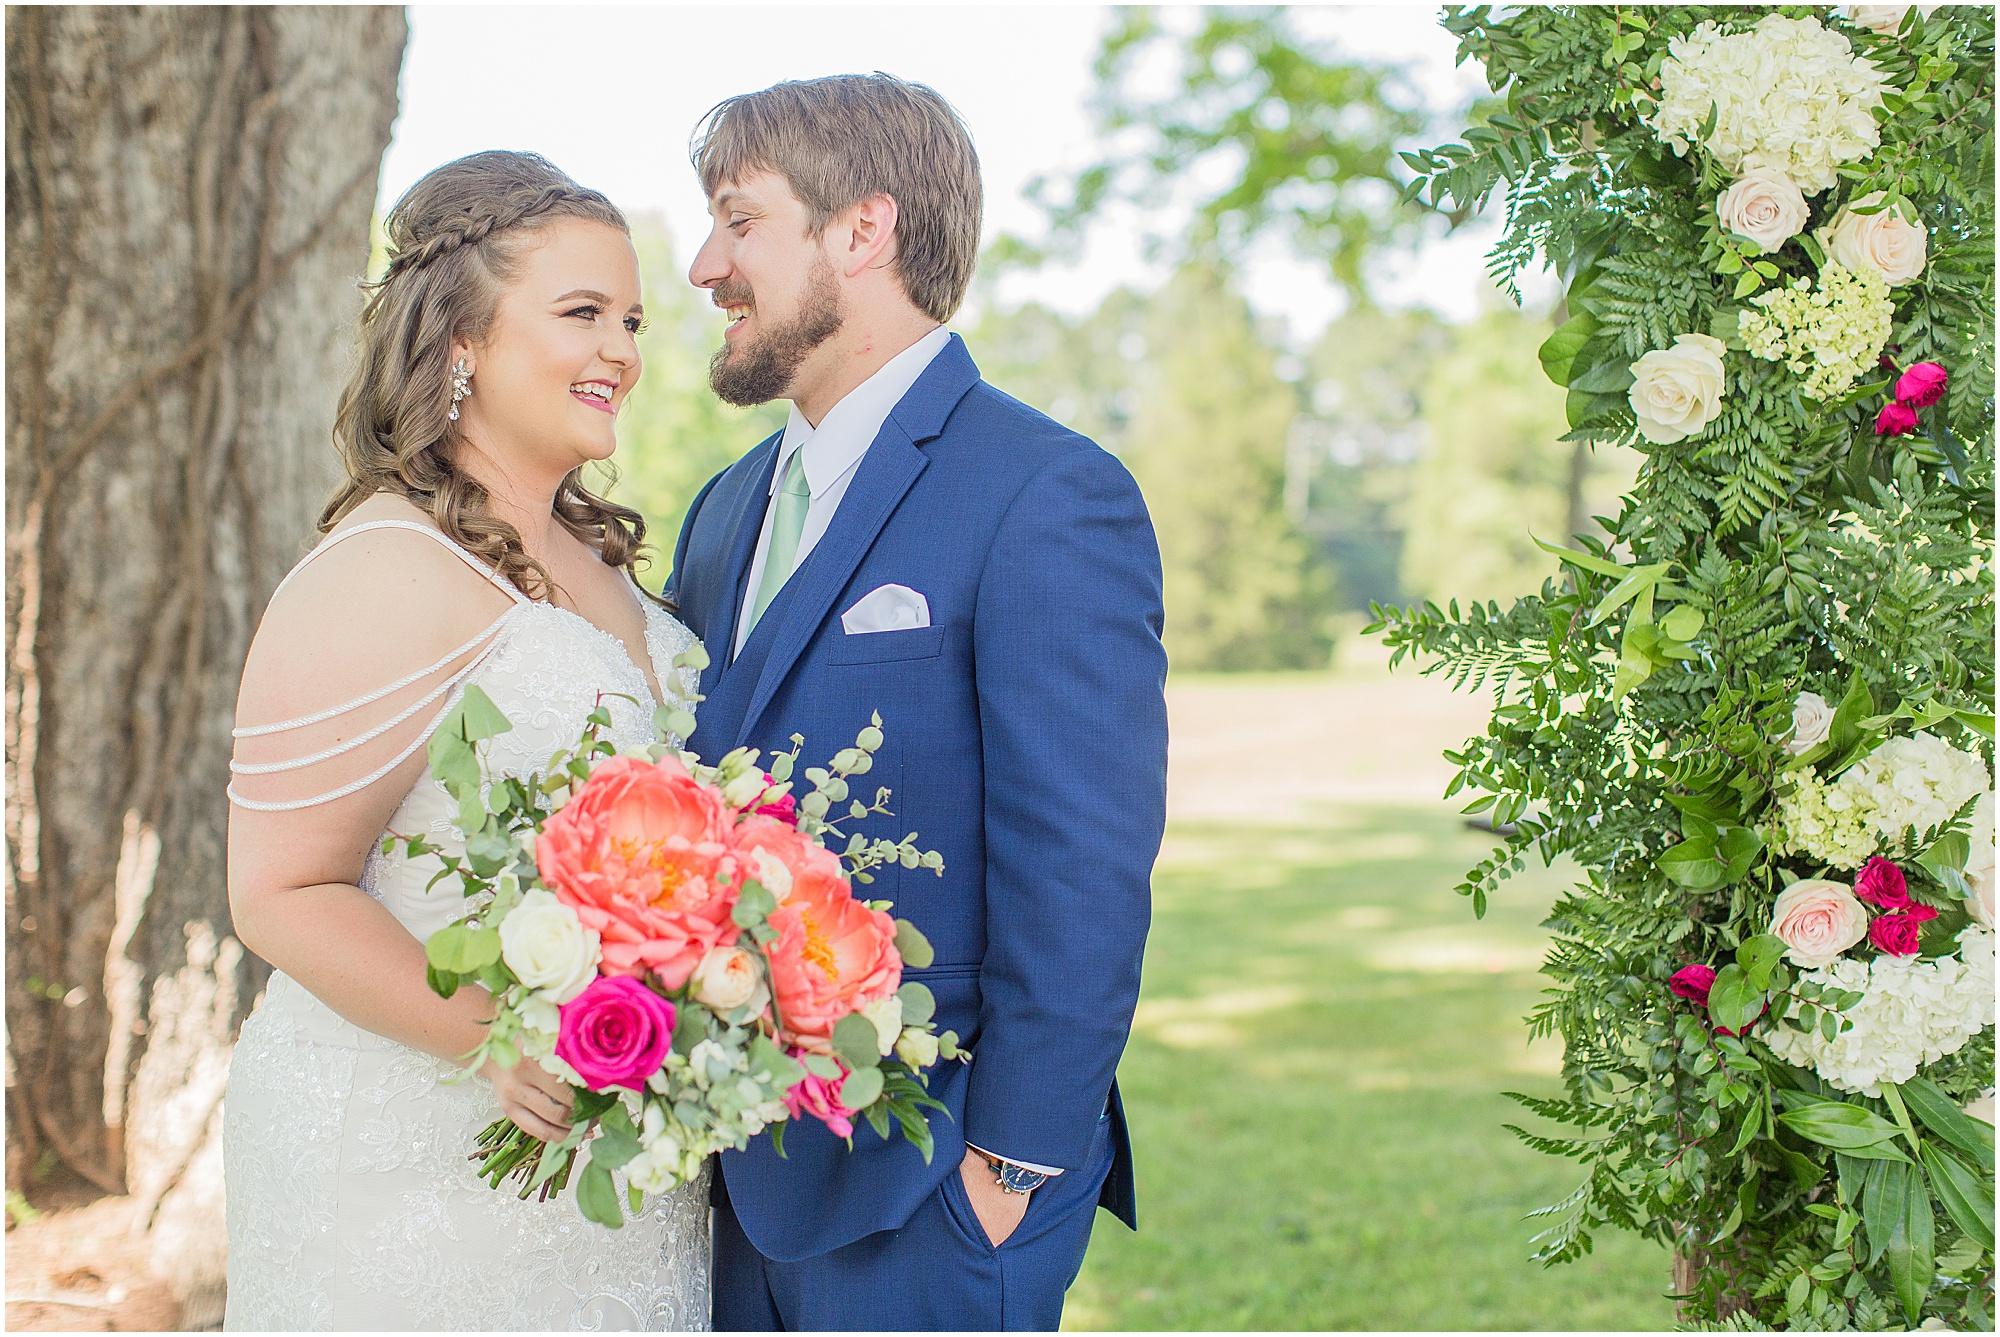 starkville-mississippi-wedding-page-place-dodson-farms_0039.jpg